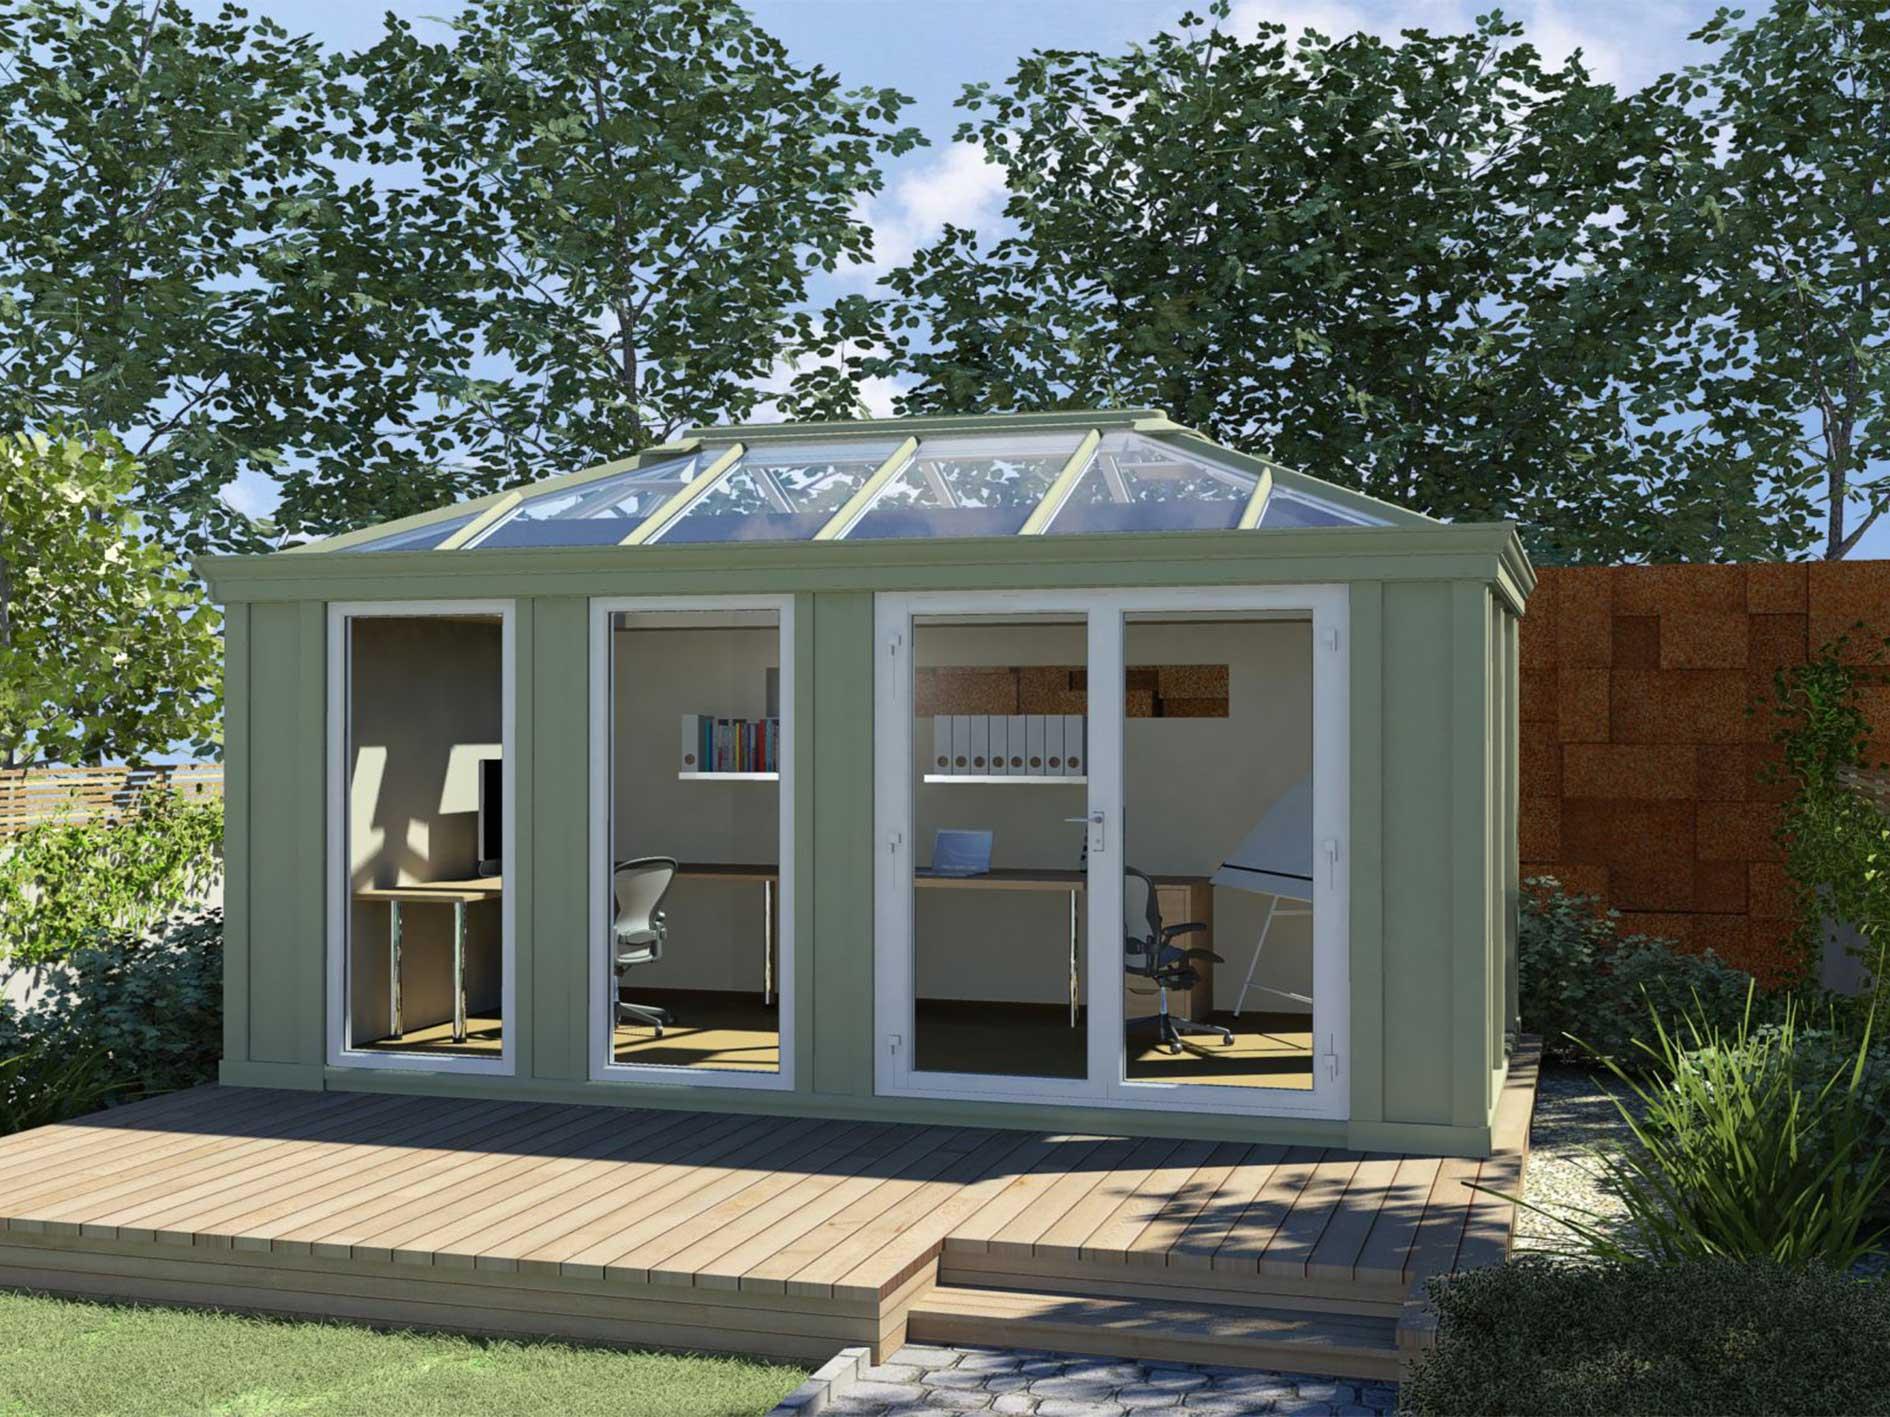 Garden rooms horsforth garden rooms prices leeds for Garden rooms prices uk